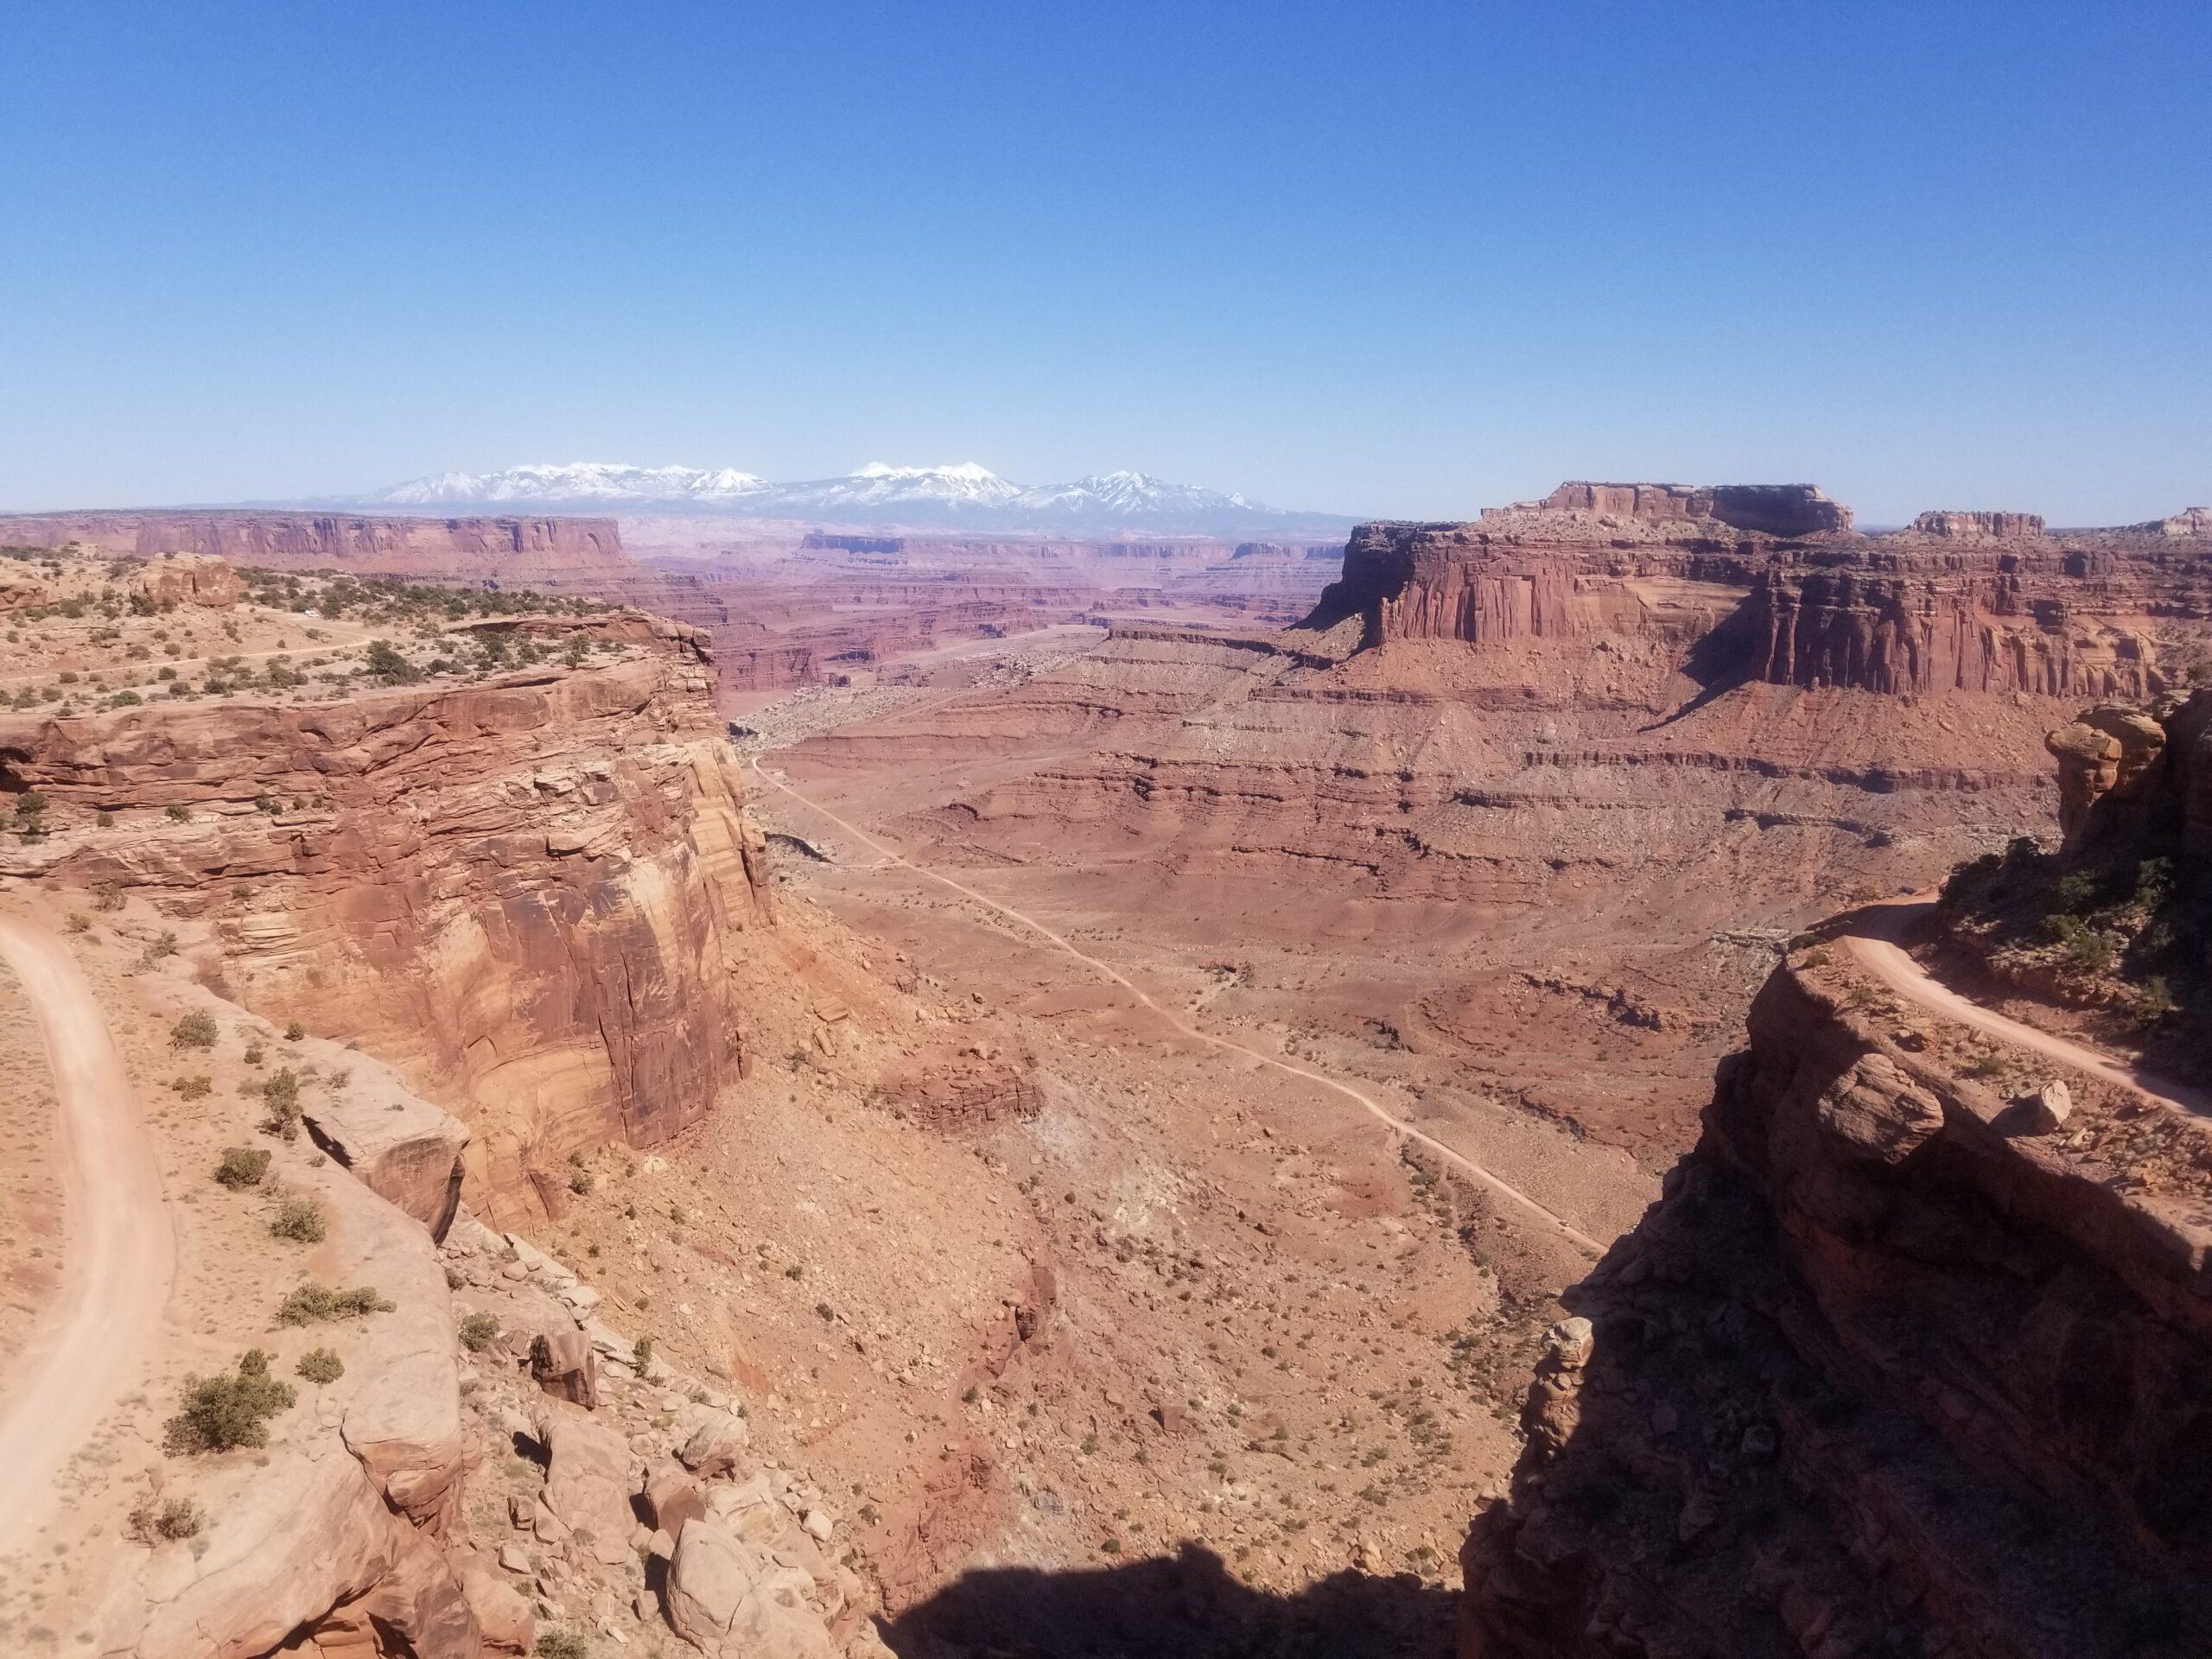 CanyonlandsVista1